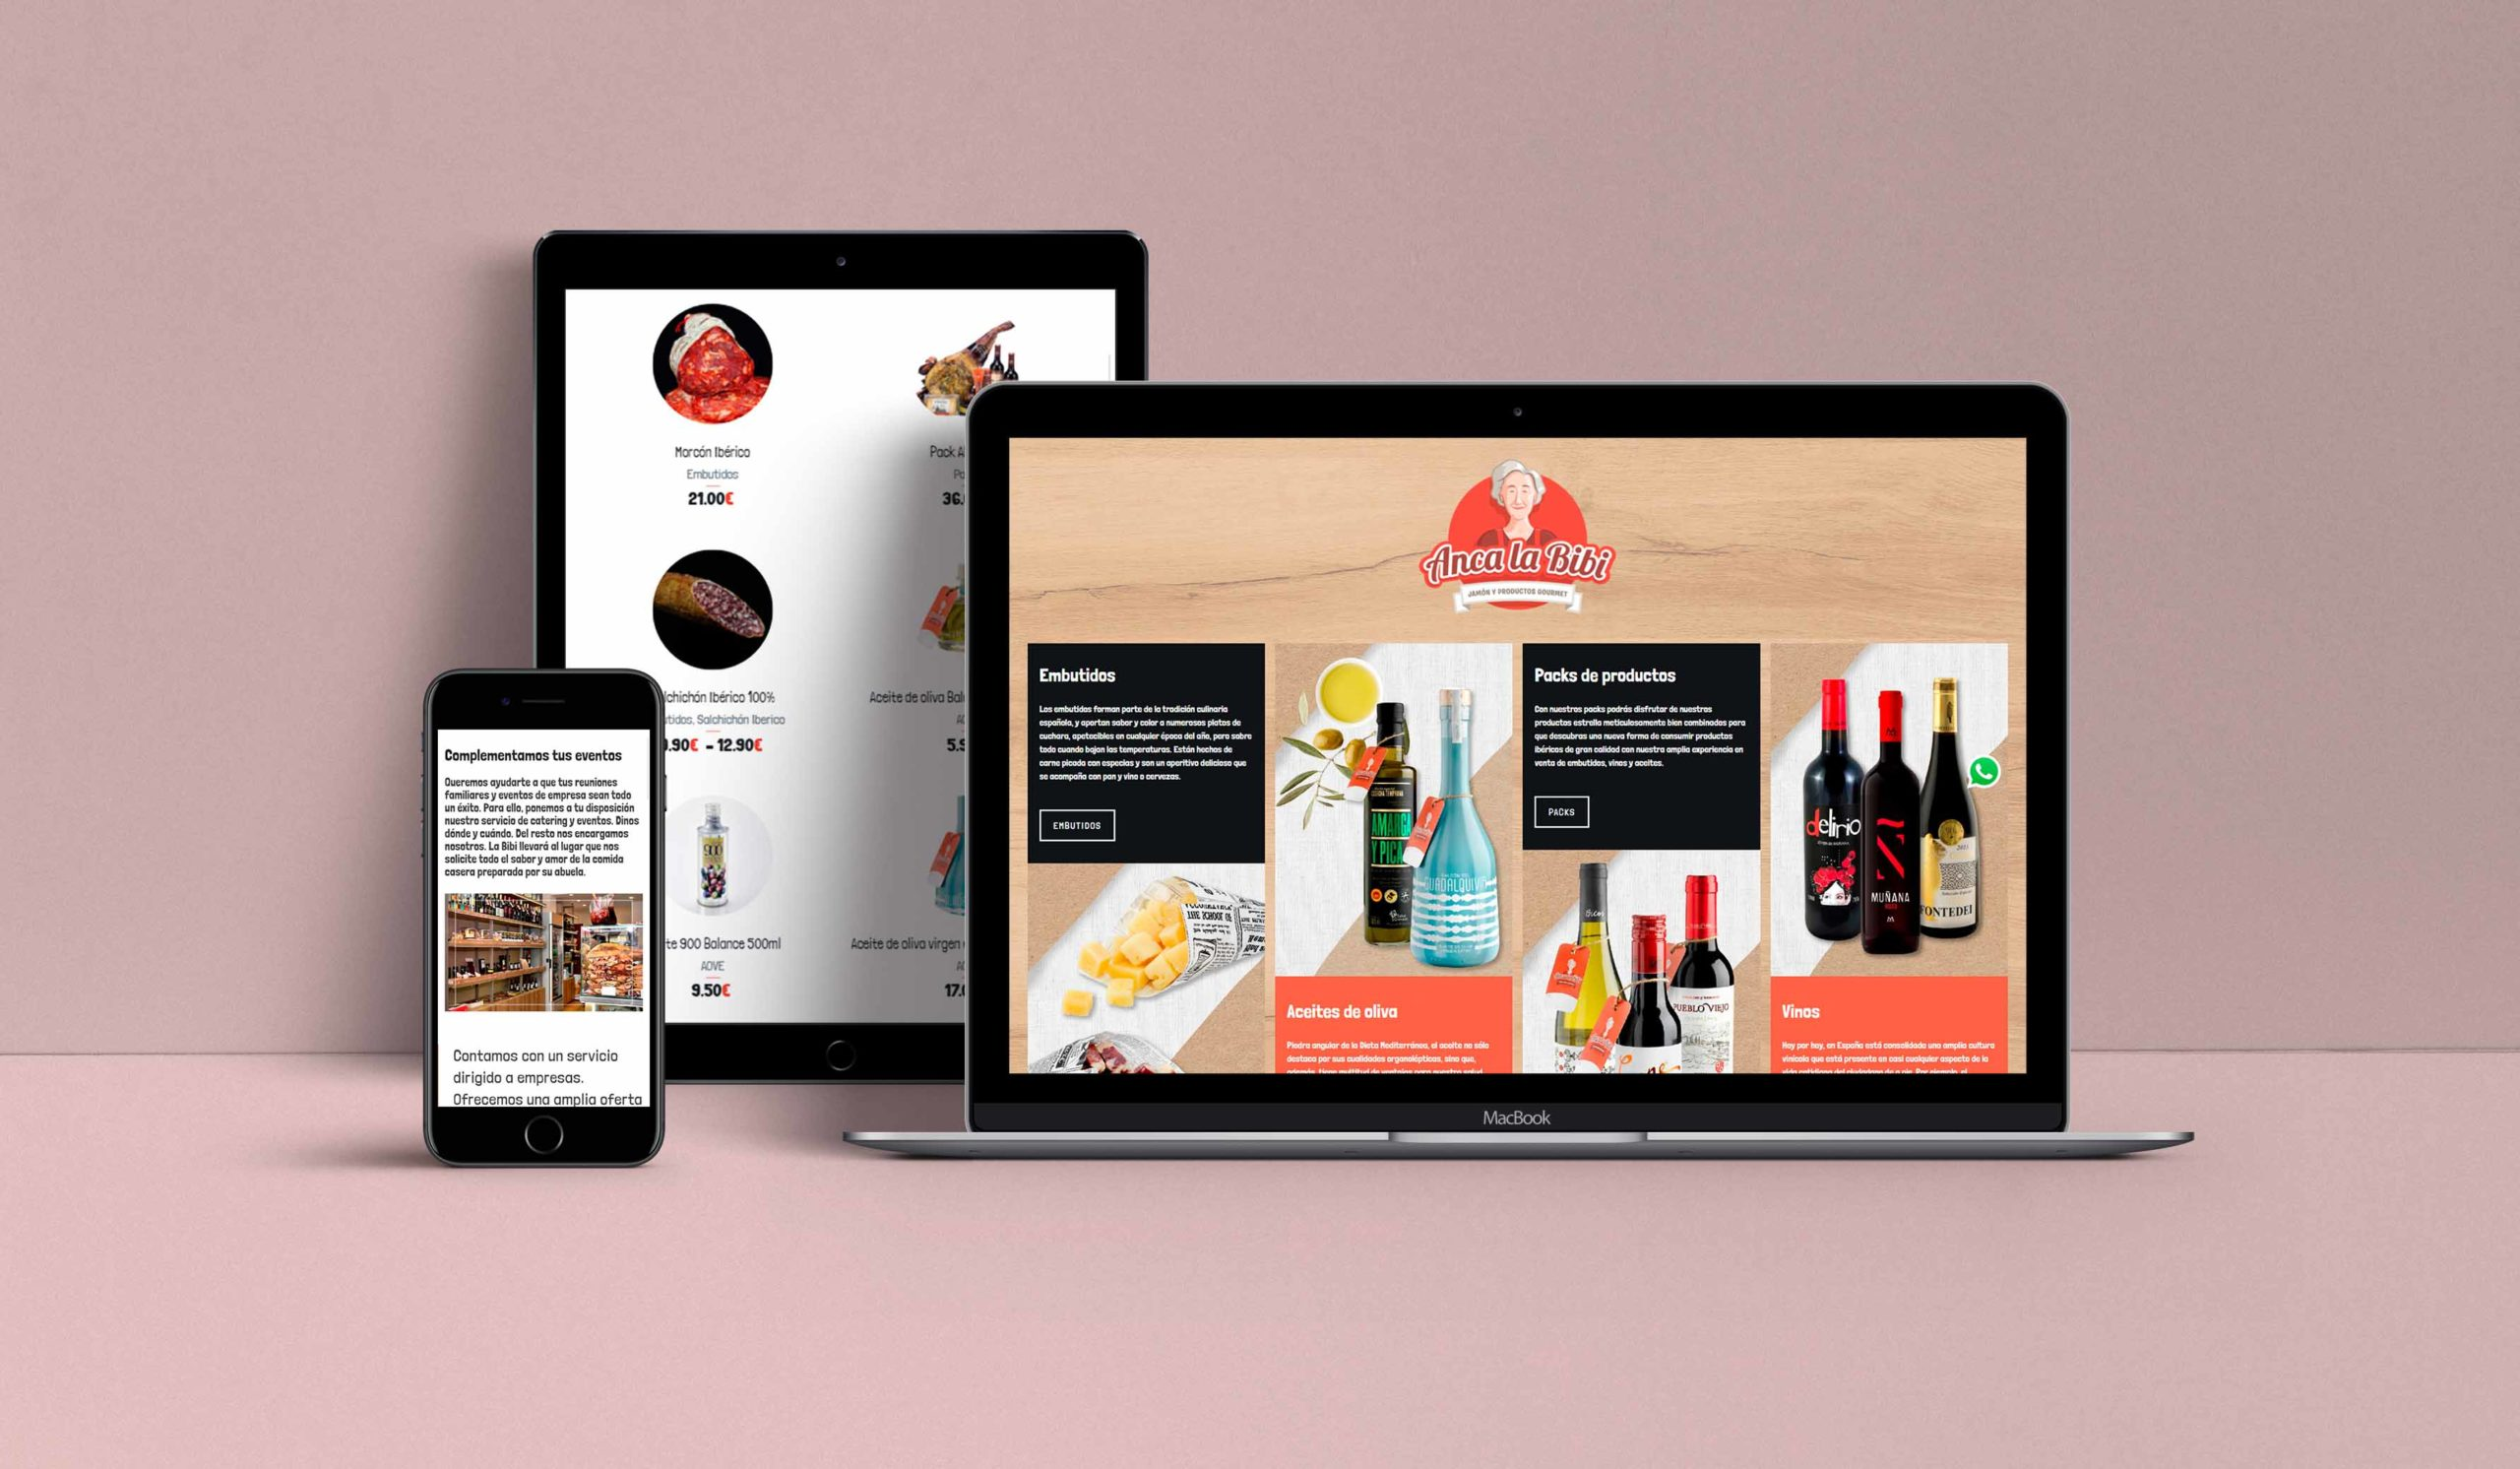 anca-la-bibi-tienda-online-gourmet